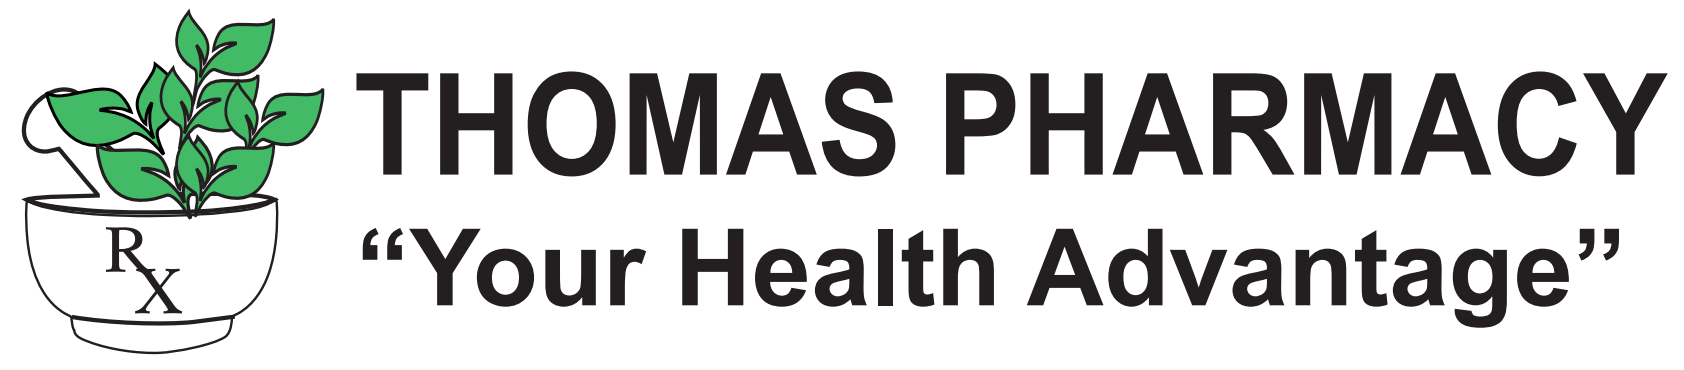 Thomas Pharmacy